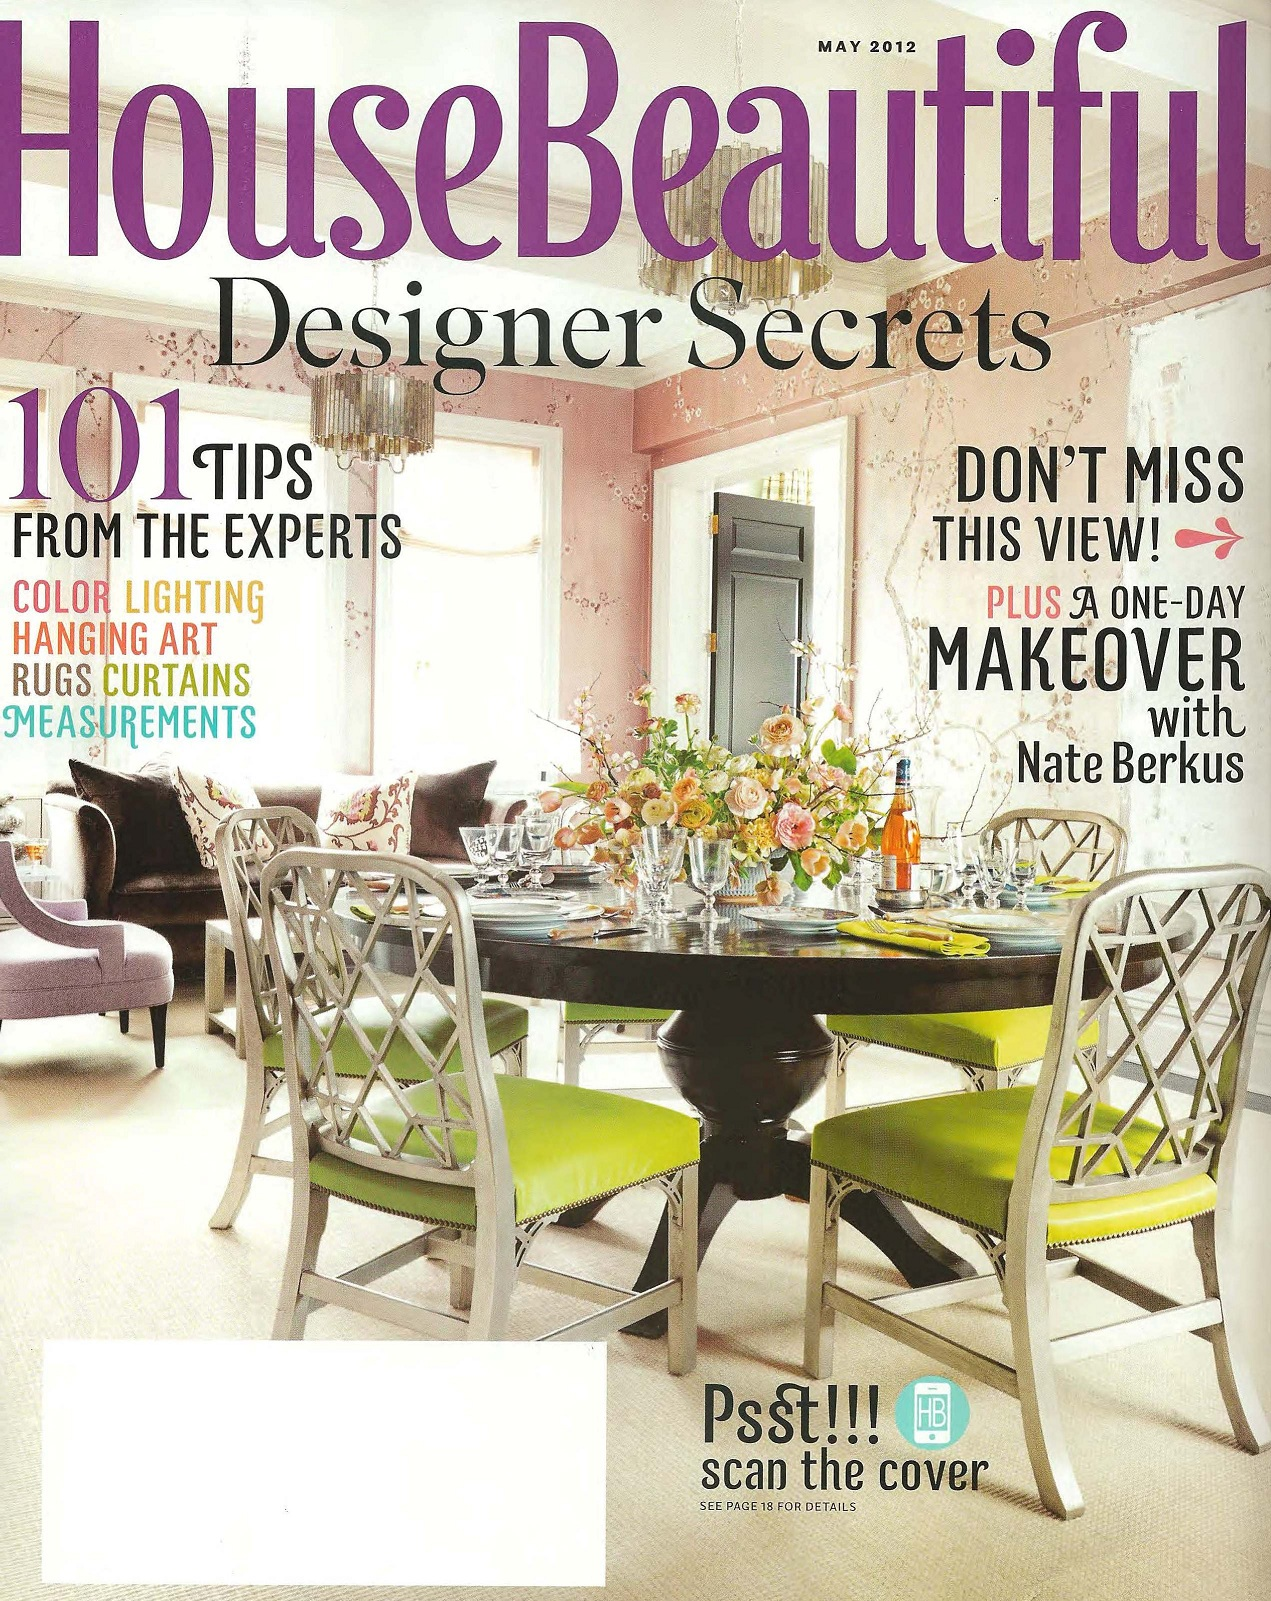 House Beautiful / May 2012